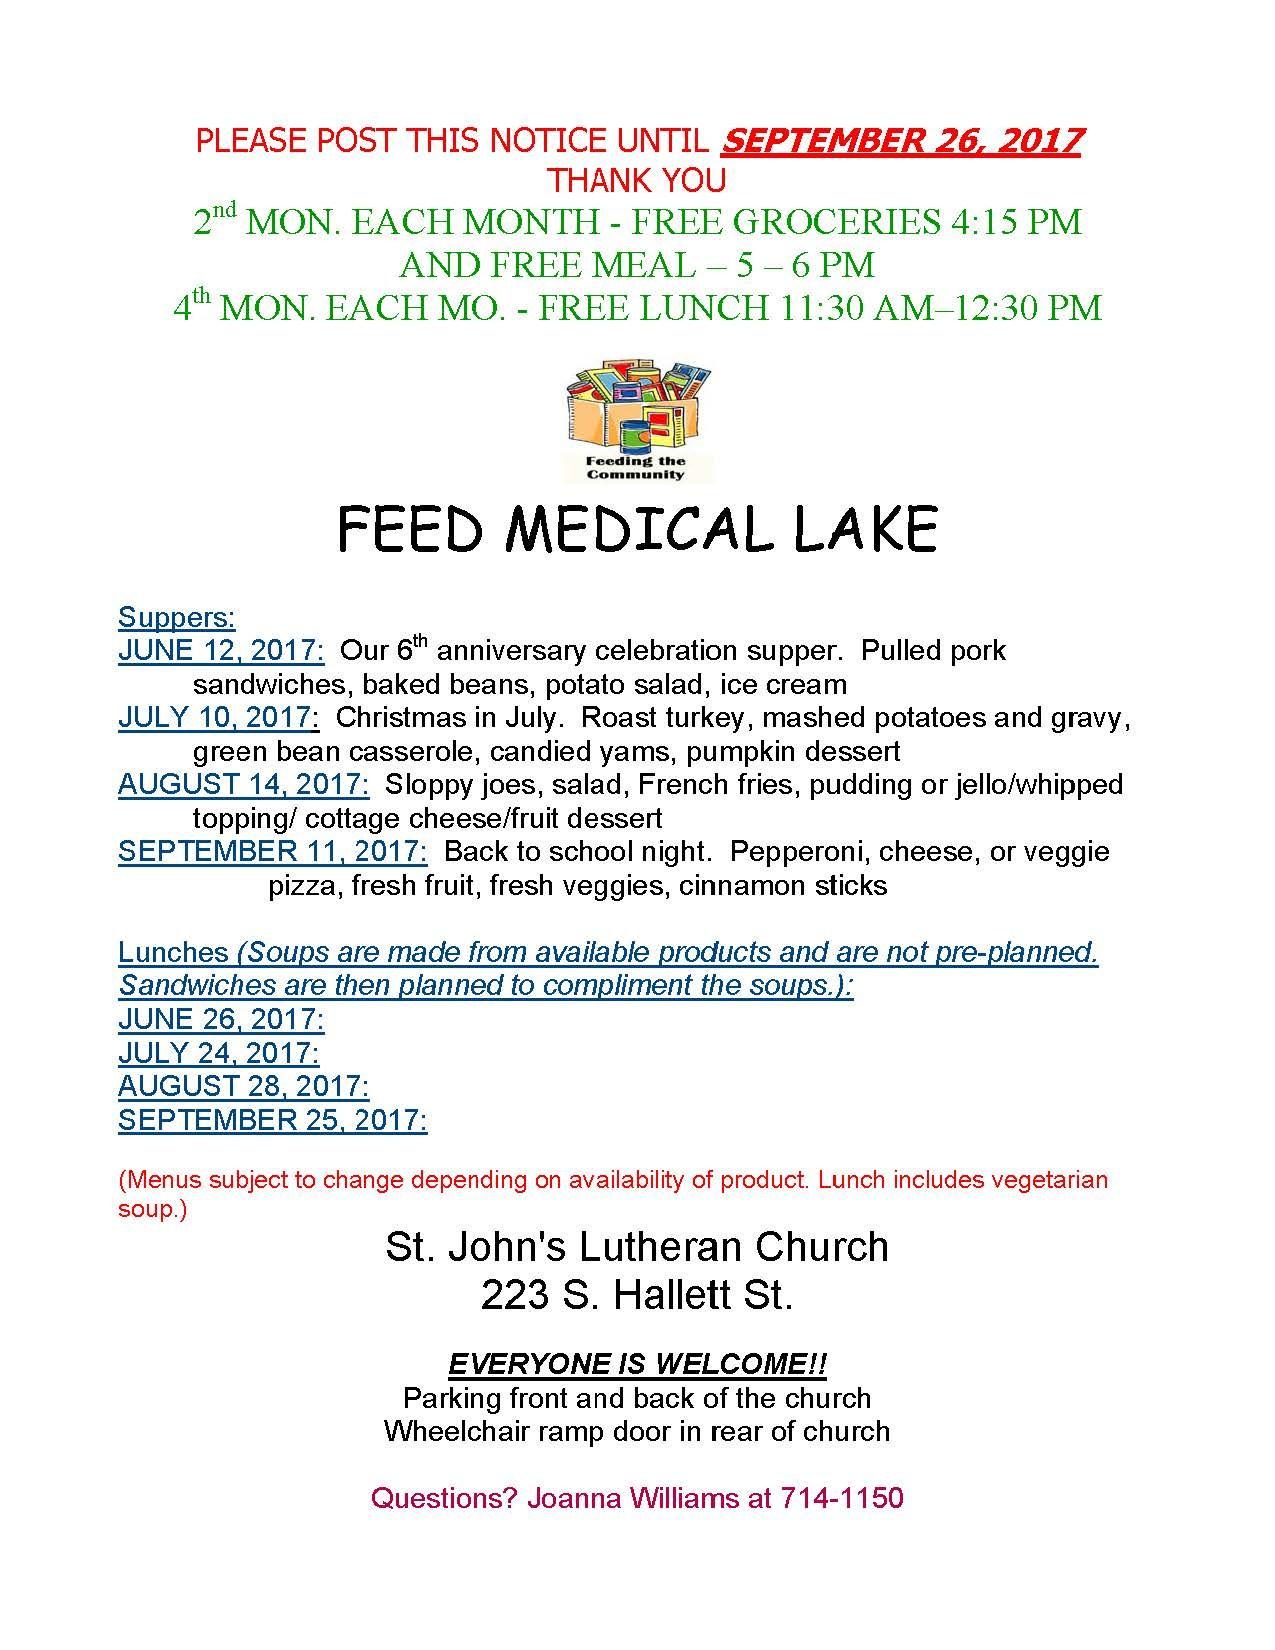 FEED Medical Lake June through September Flyer